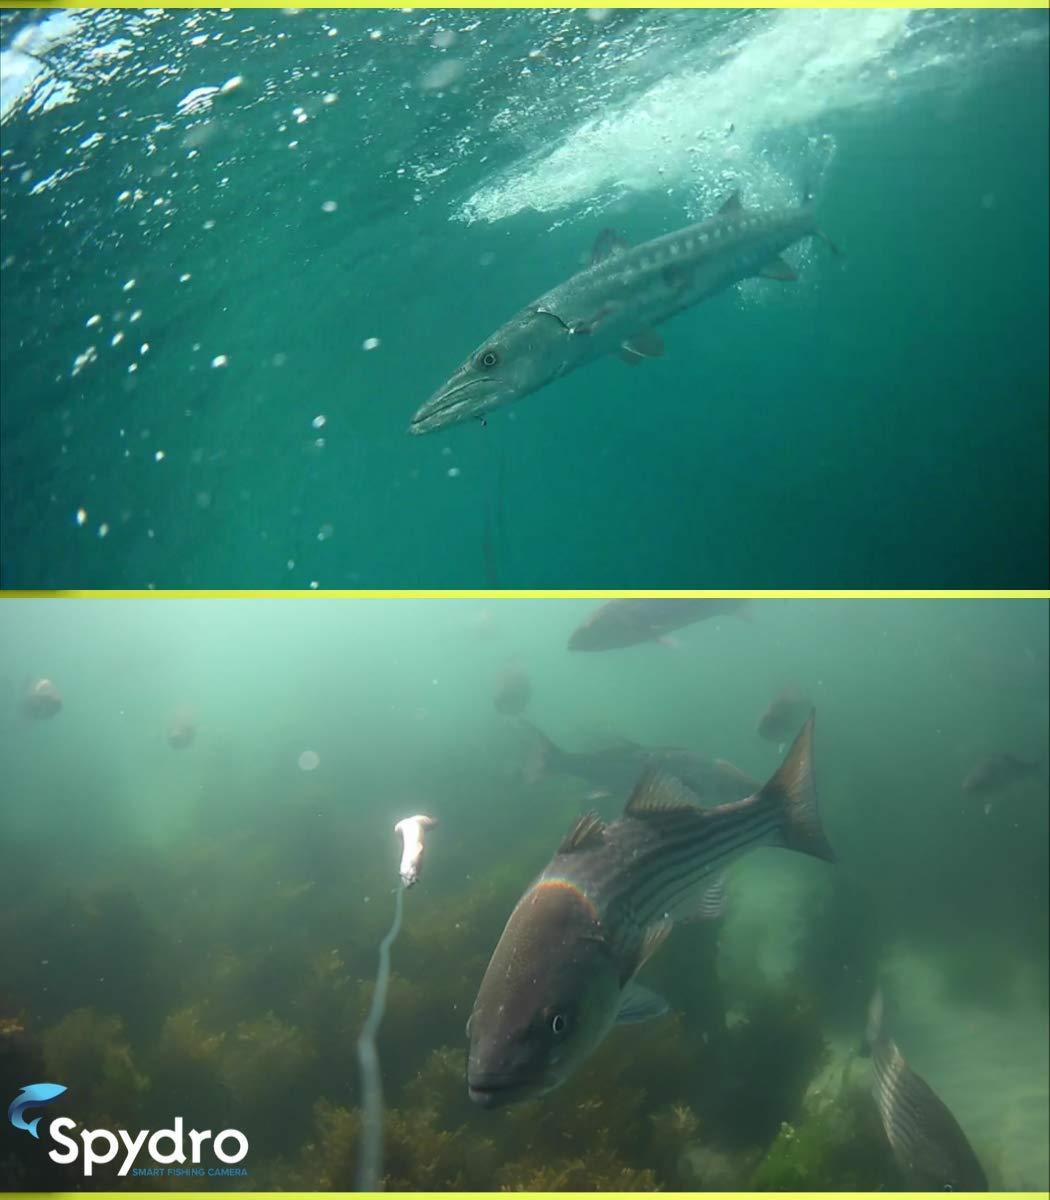 New Spydro 32GB The Best Advanced Smart Underwater Fishing Camera HD 1080